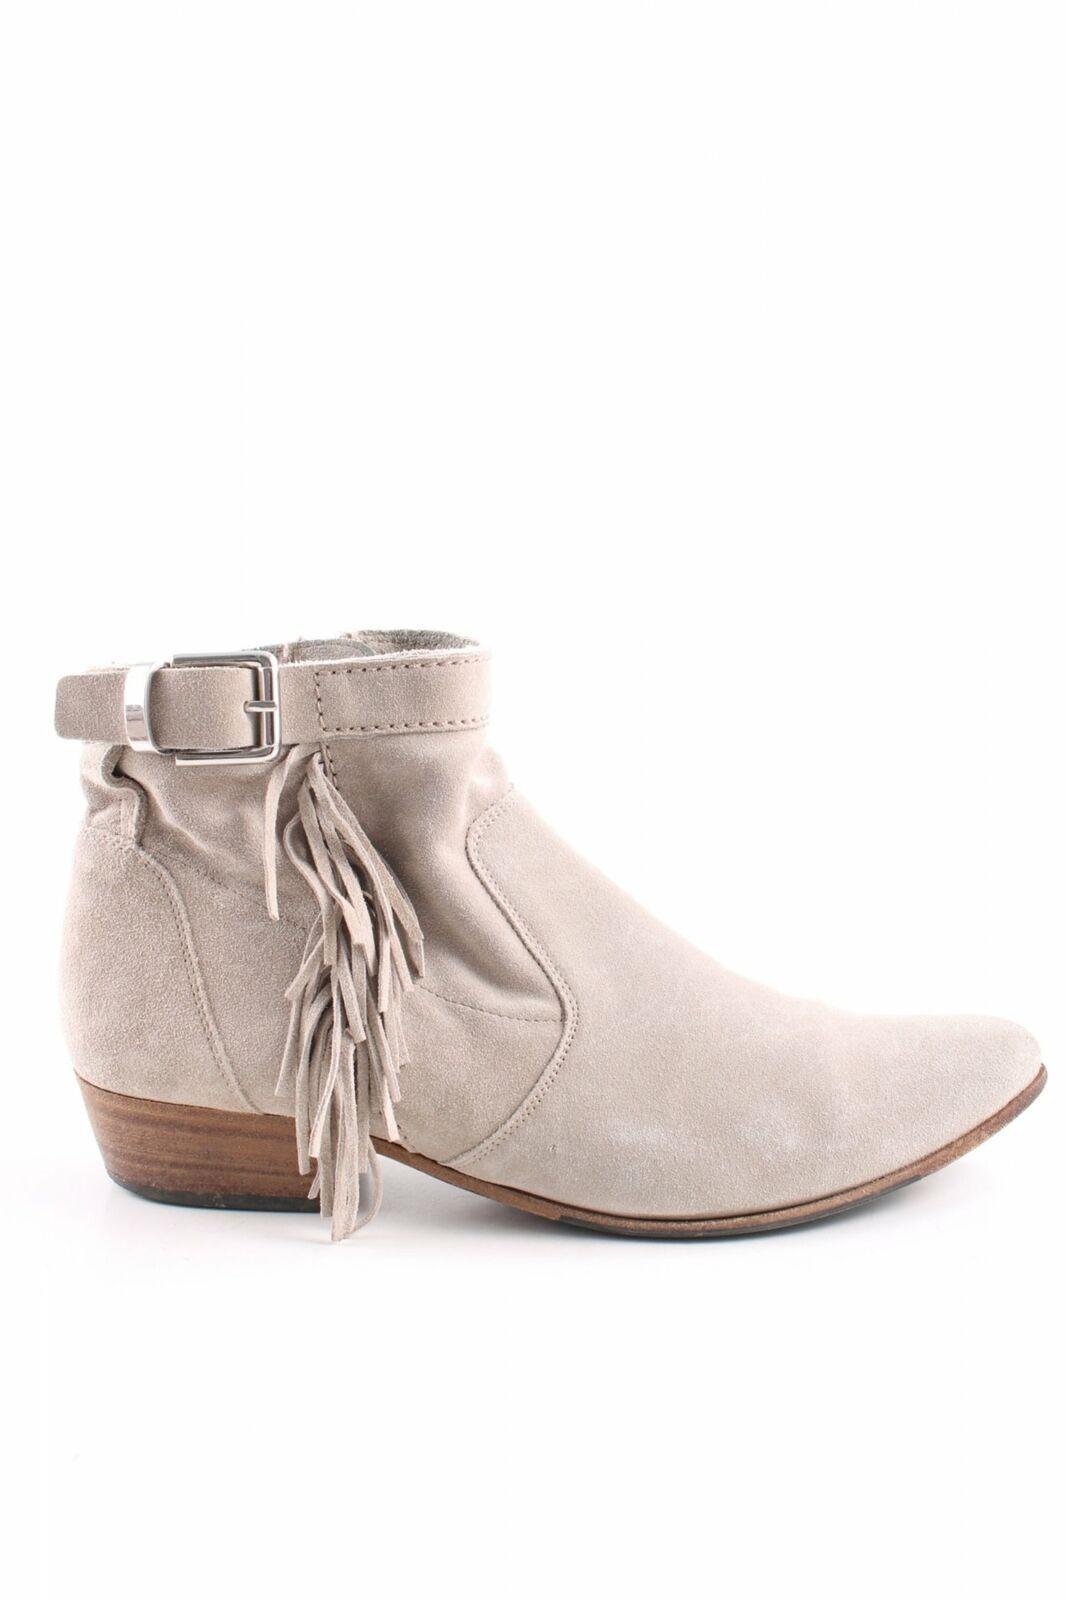 KENNEL + SCHMENGER Ankle Stiefel creme Business-Look Damen Gr. DE 38,5 Leder